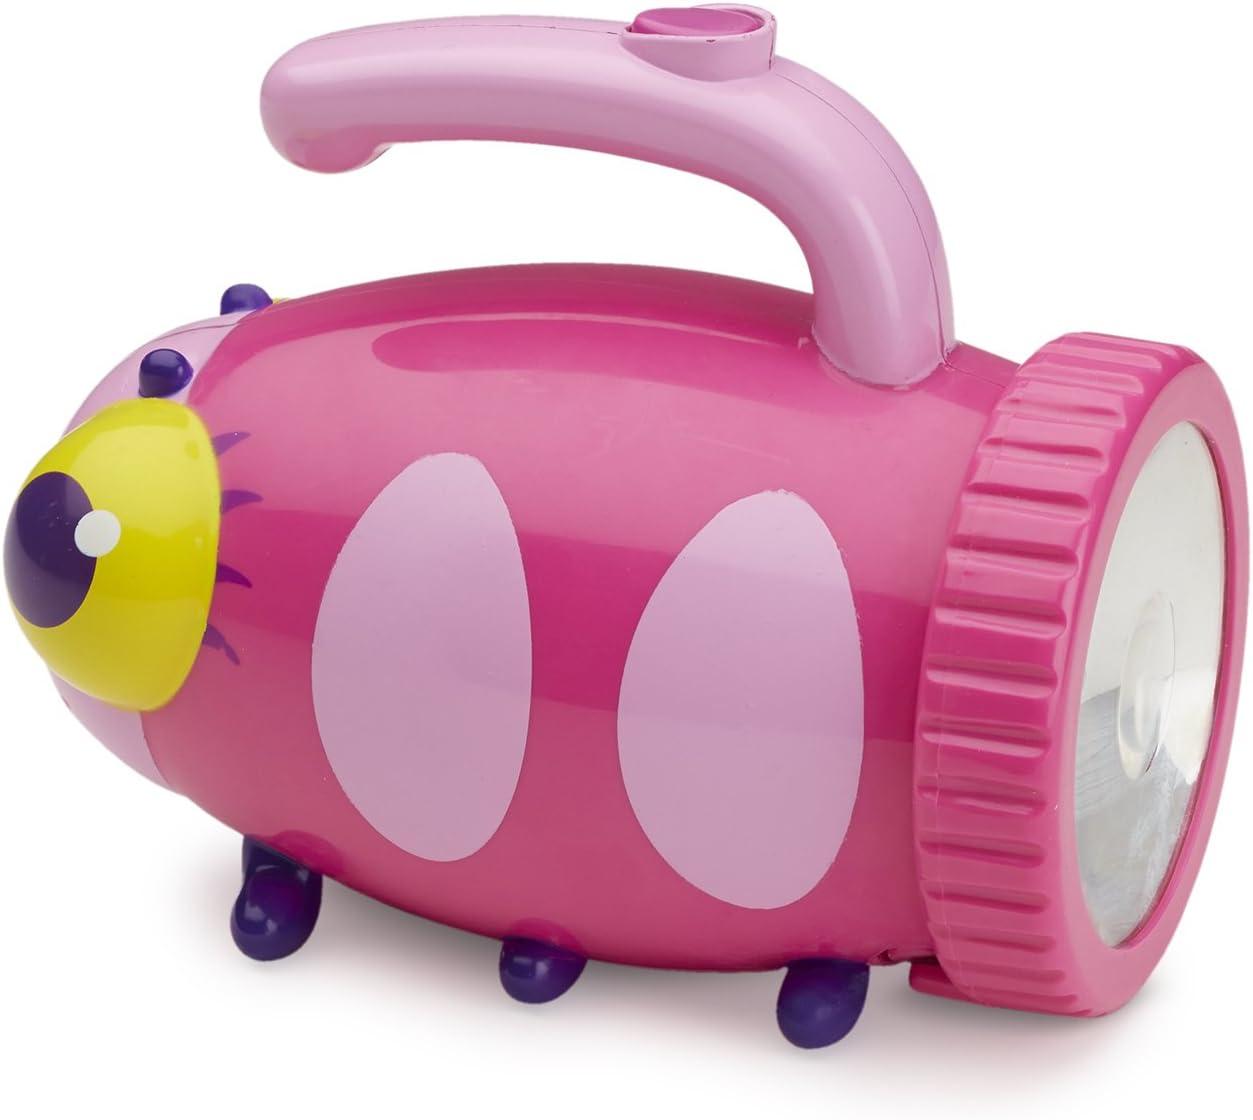 Melissa & Doug Trixie Ladybug Flashlight: Toy: Toys & Games